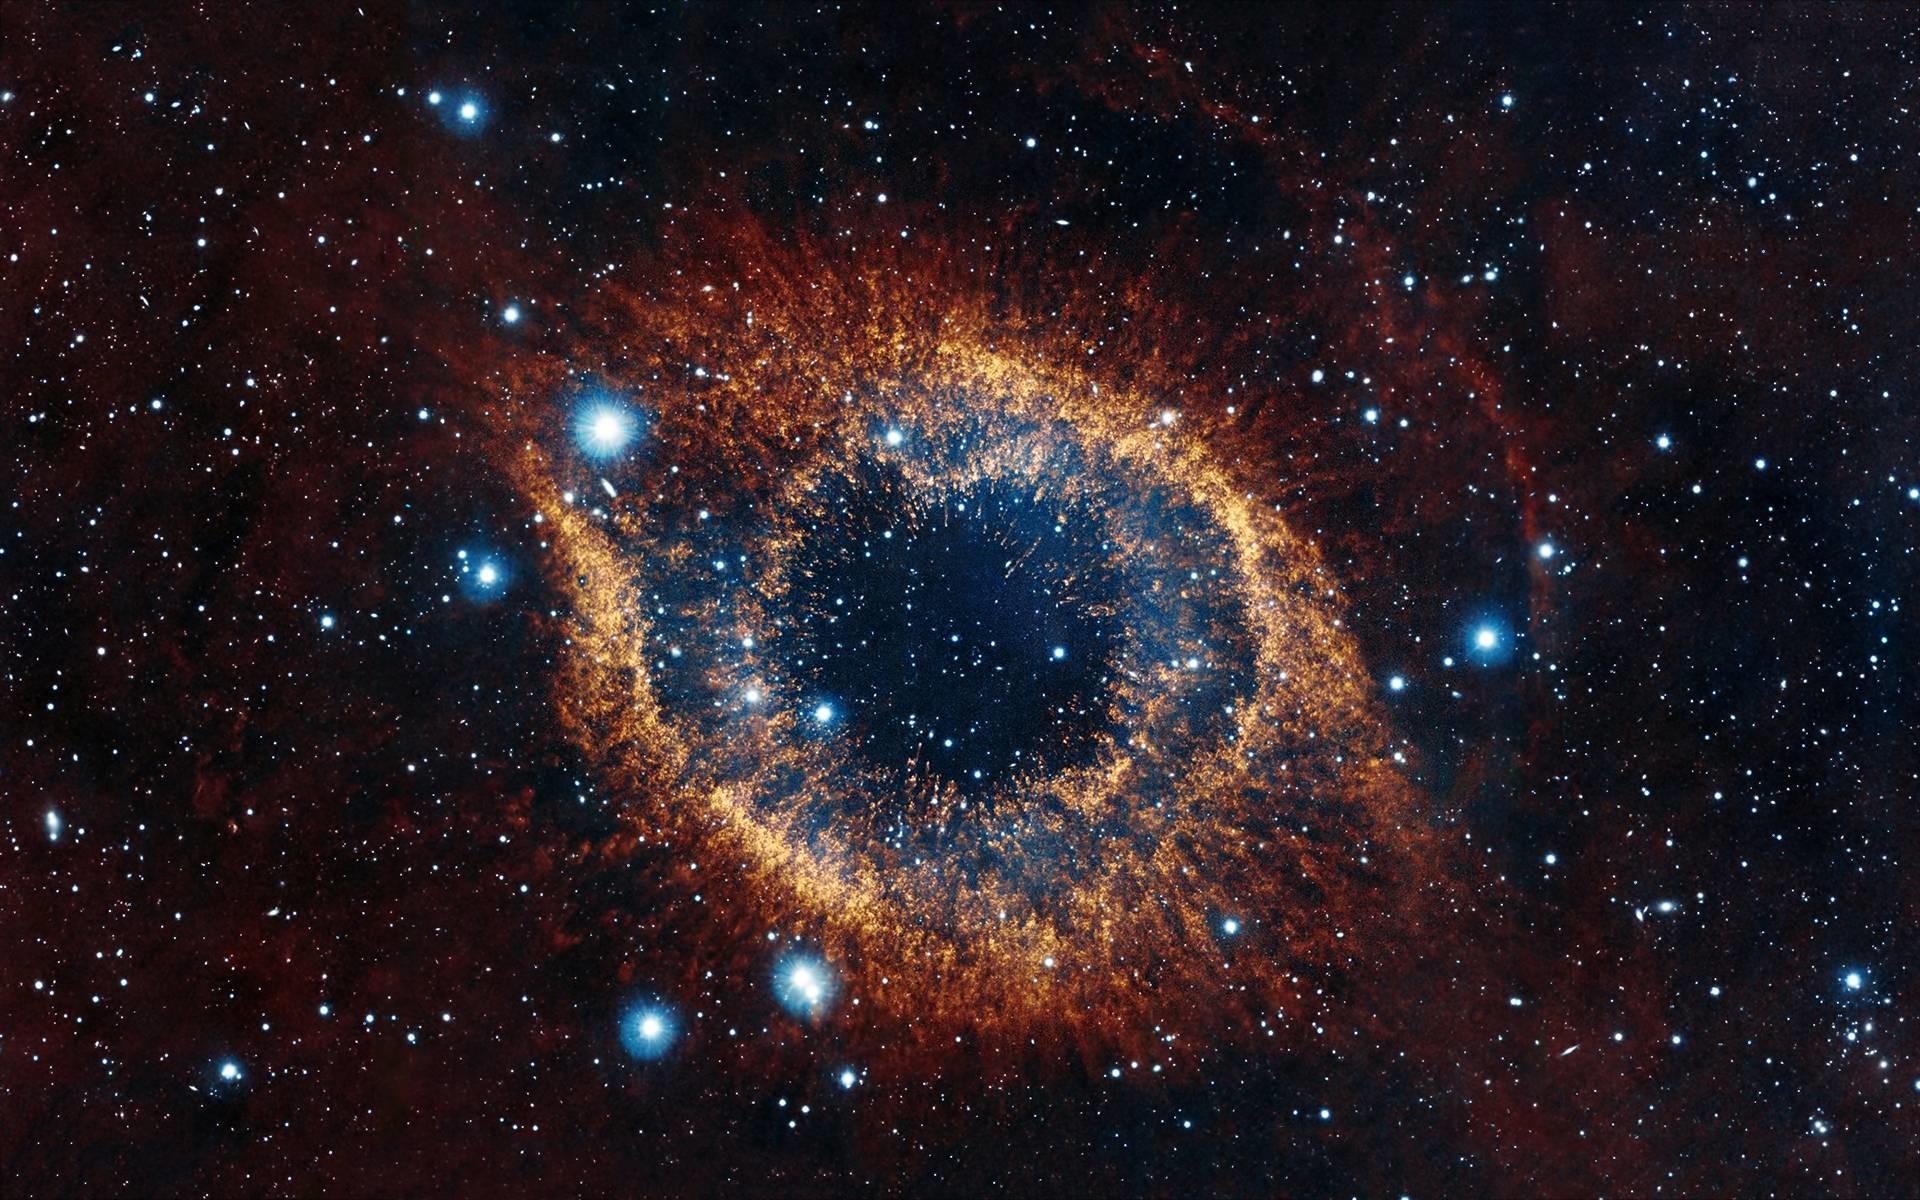 Eye Of God Nebula Wallpaper 59 Images